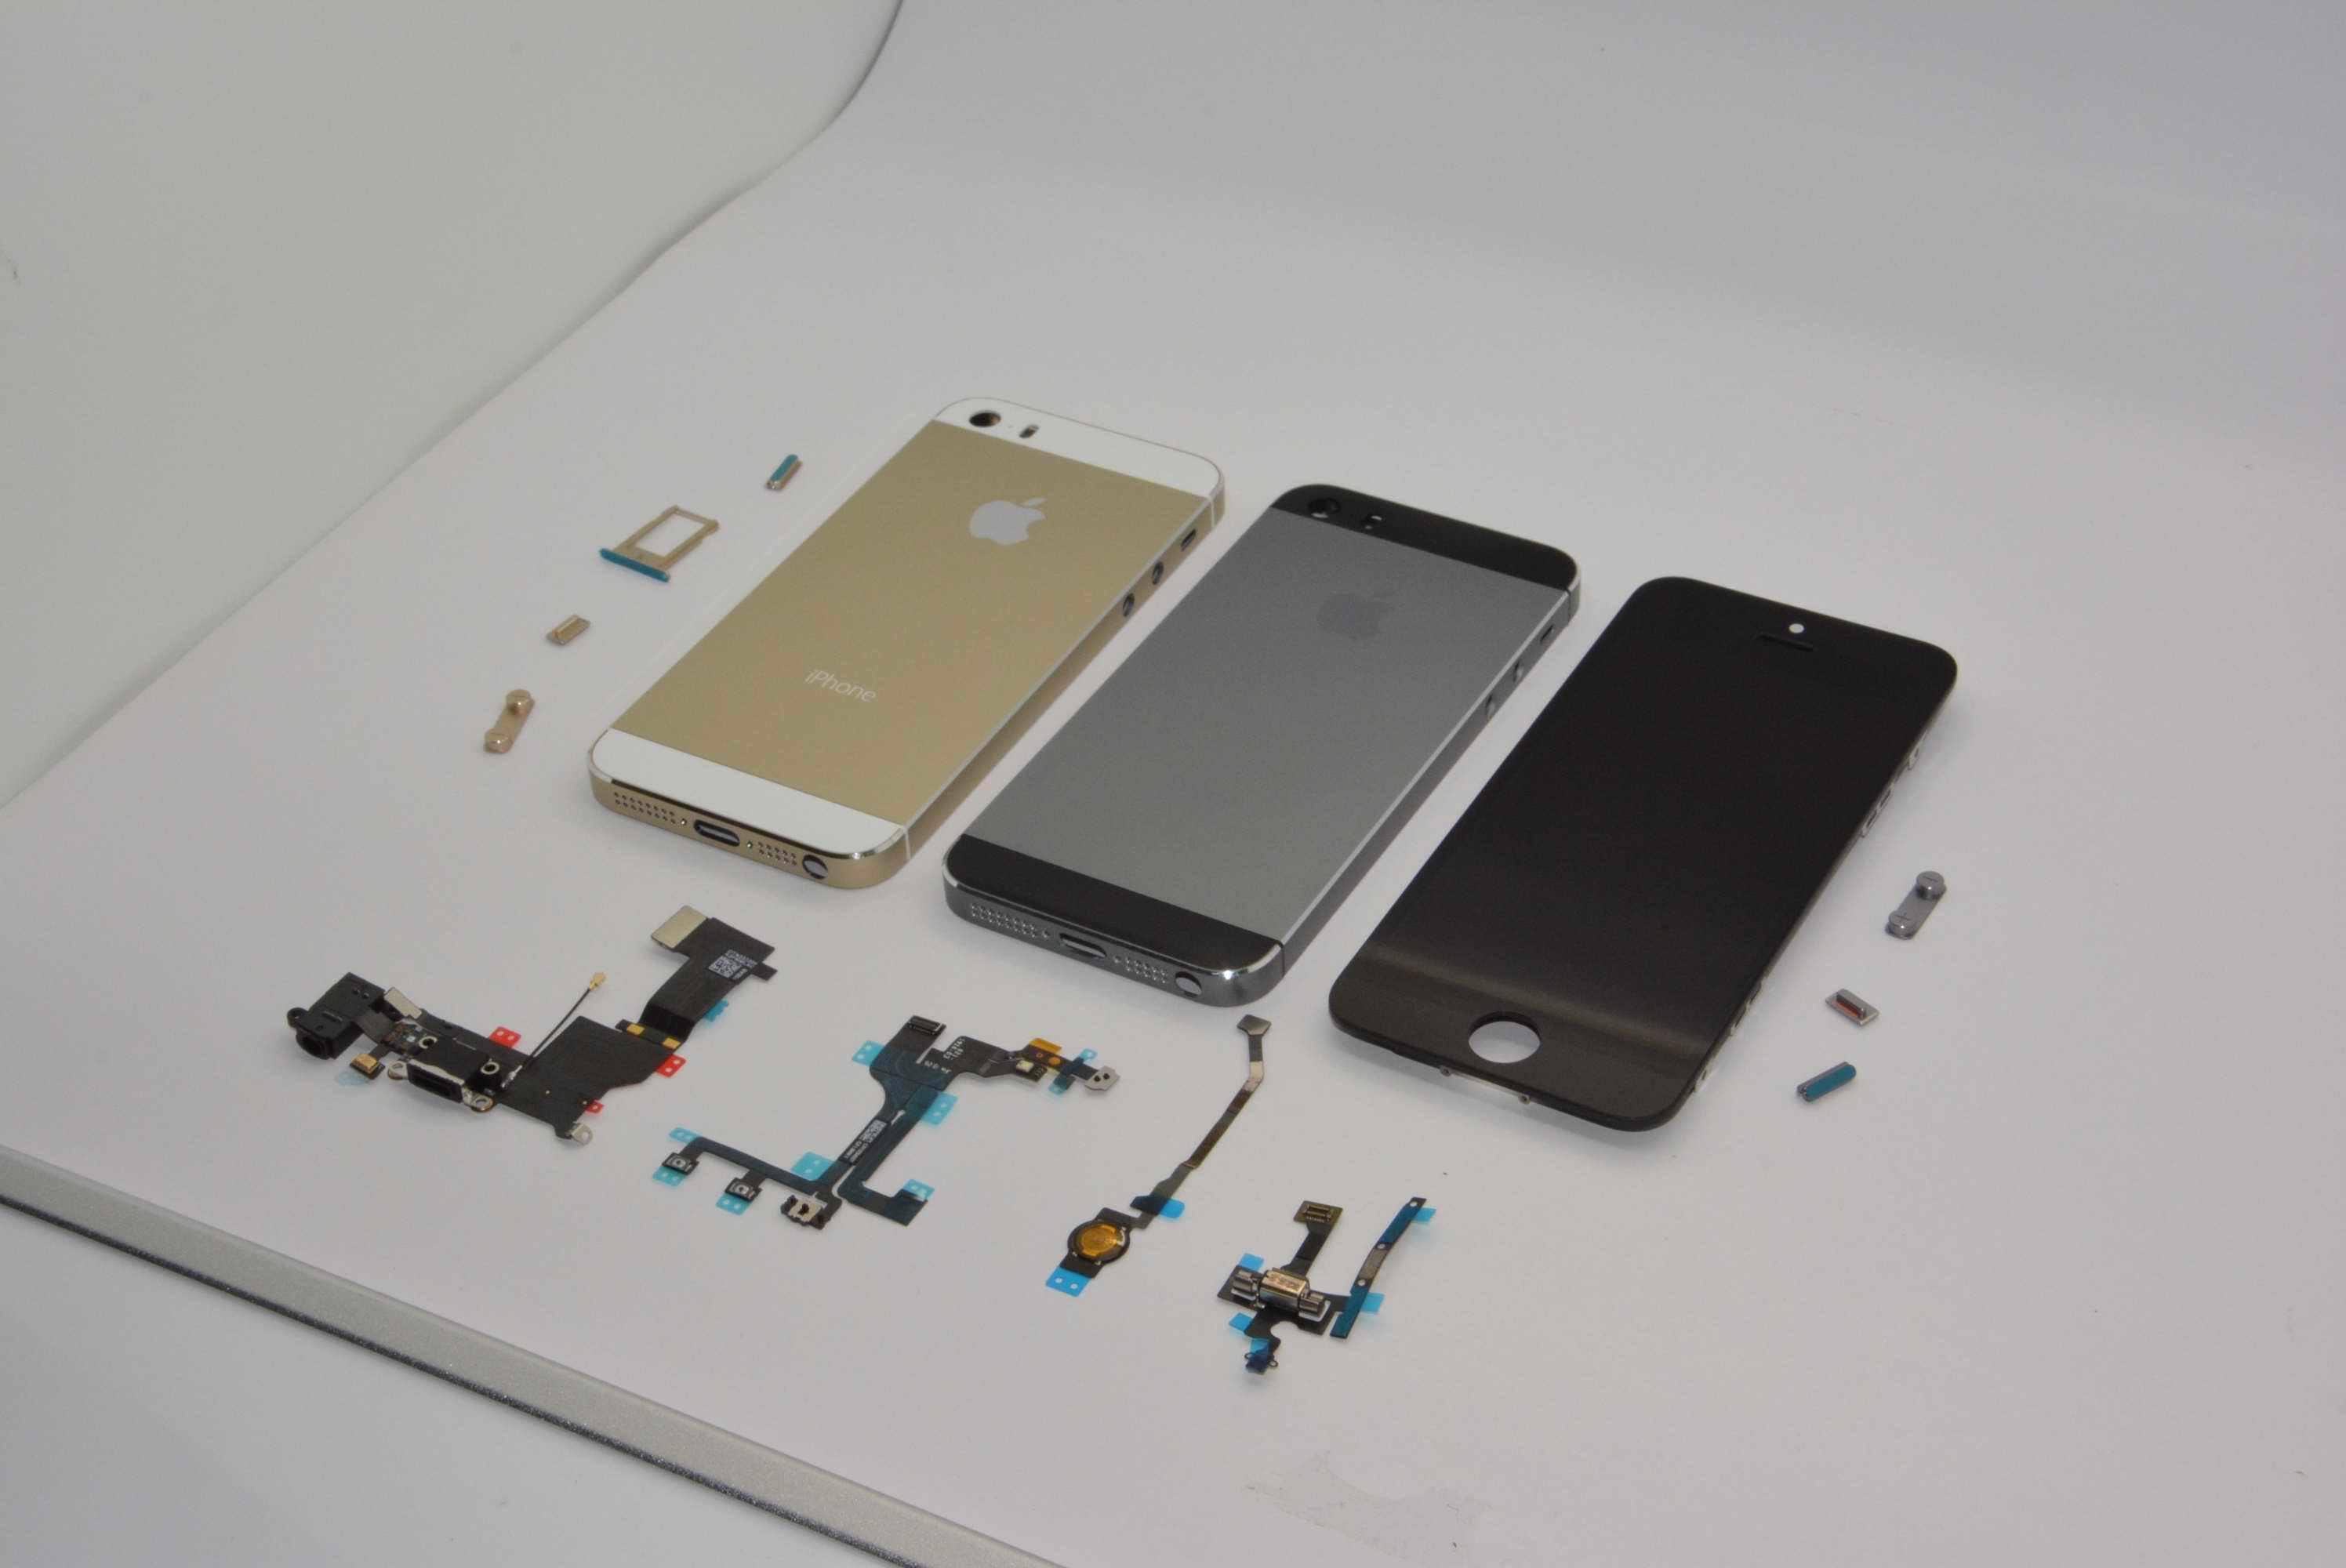 iPhone 5Sは3色展開ではない!?新色グラファイトカラーがリーク!